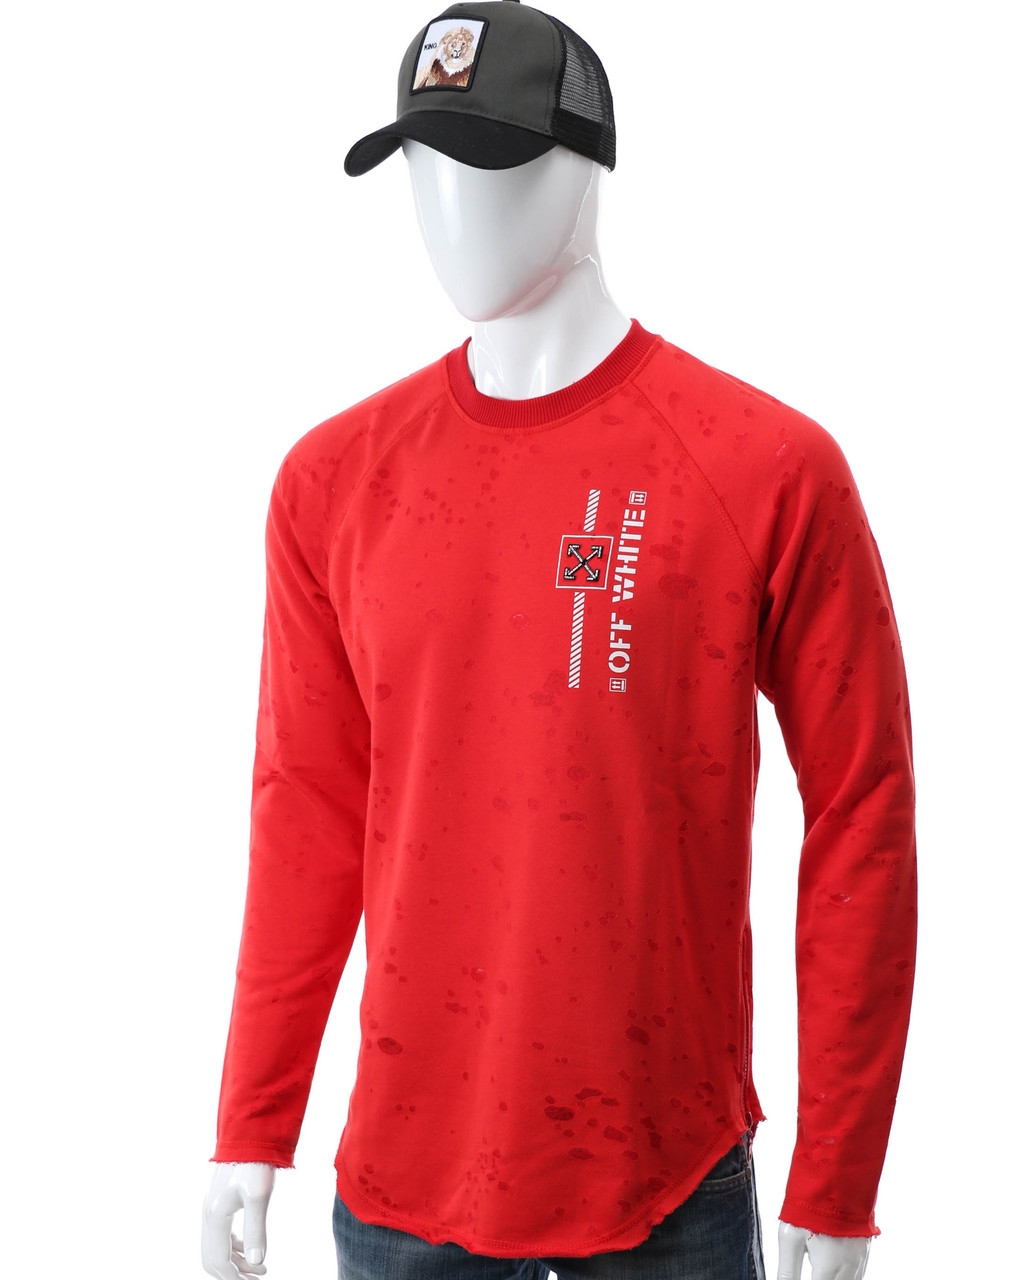 Свитшот красный OFF-WHITE #10 Р-2 RED L(Р) 20-516-212